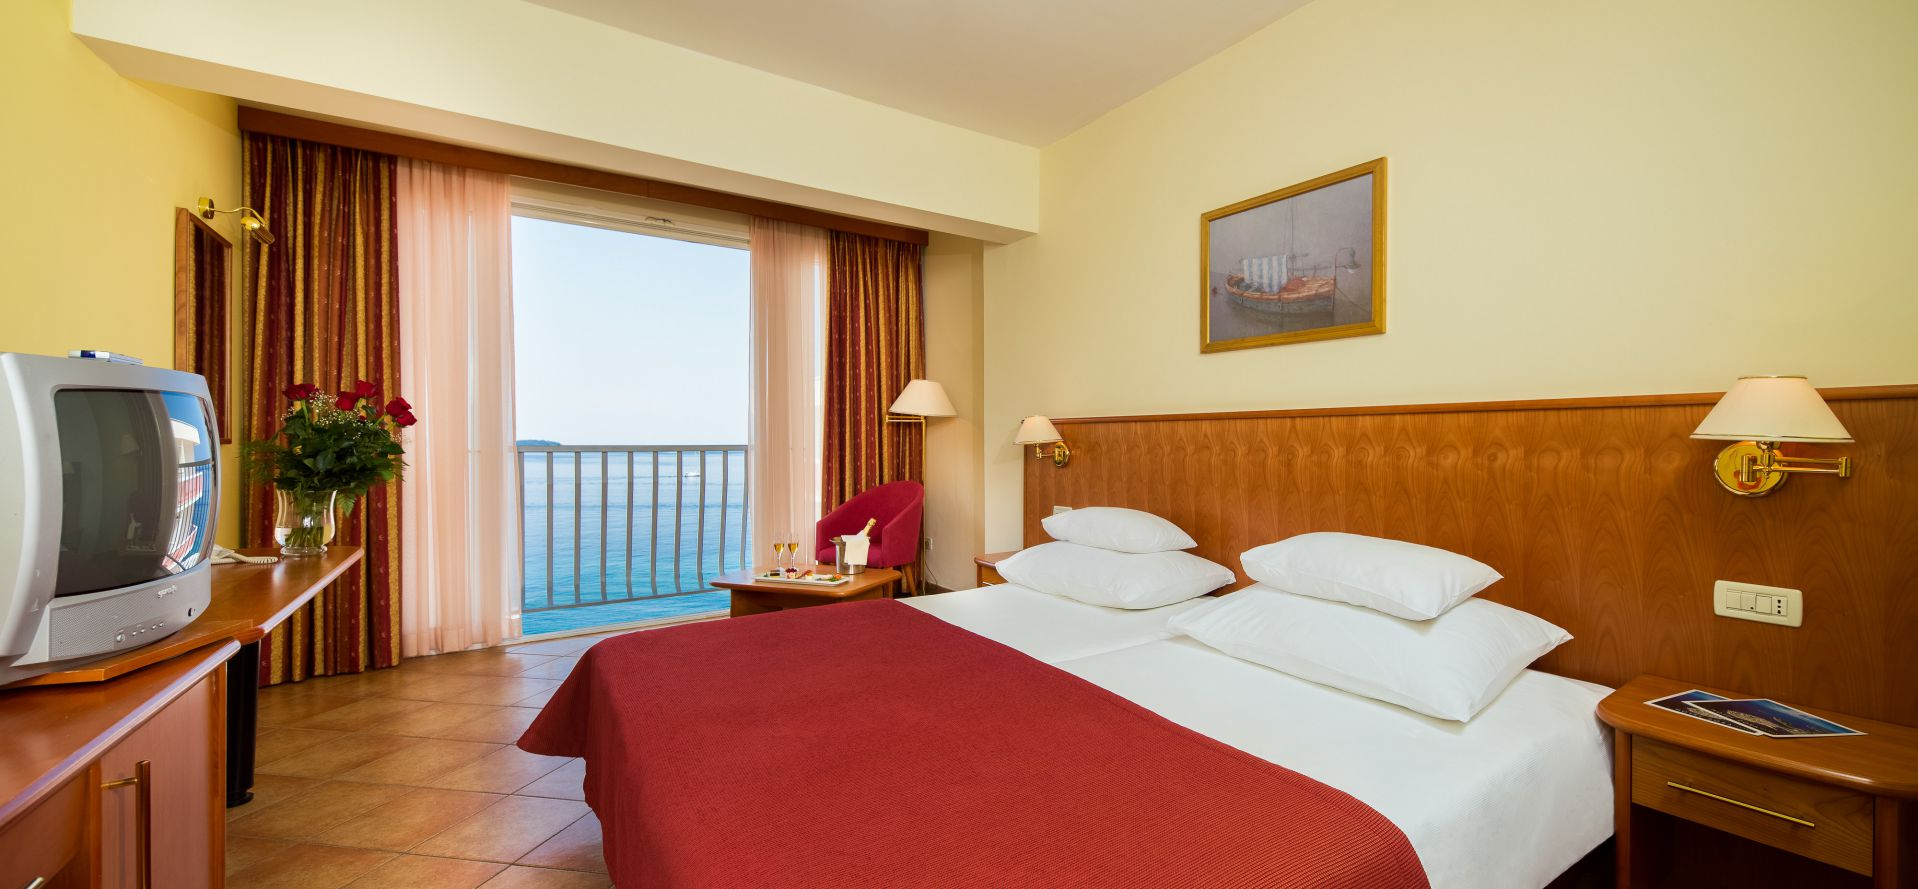 premier club room 01 14638809689 o - Zora Hotel